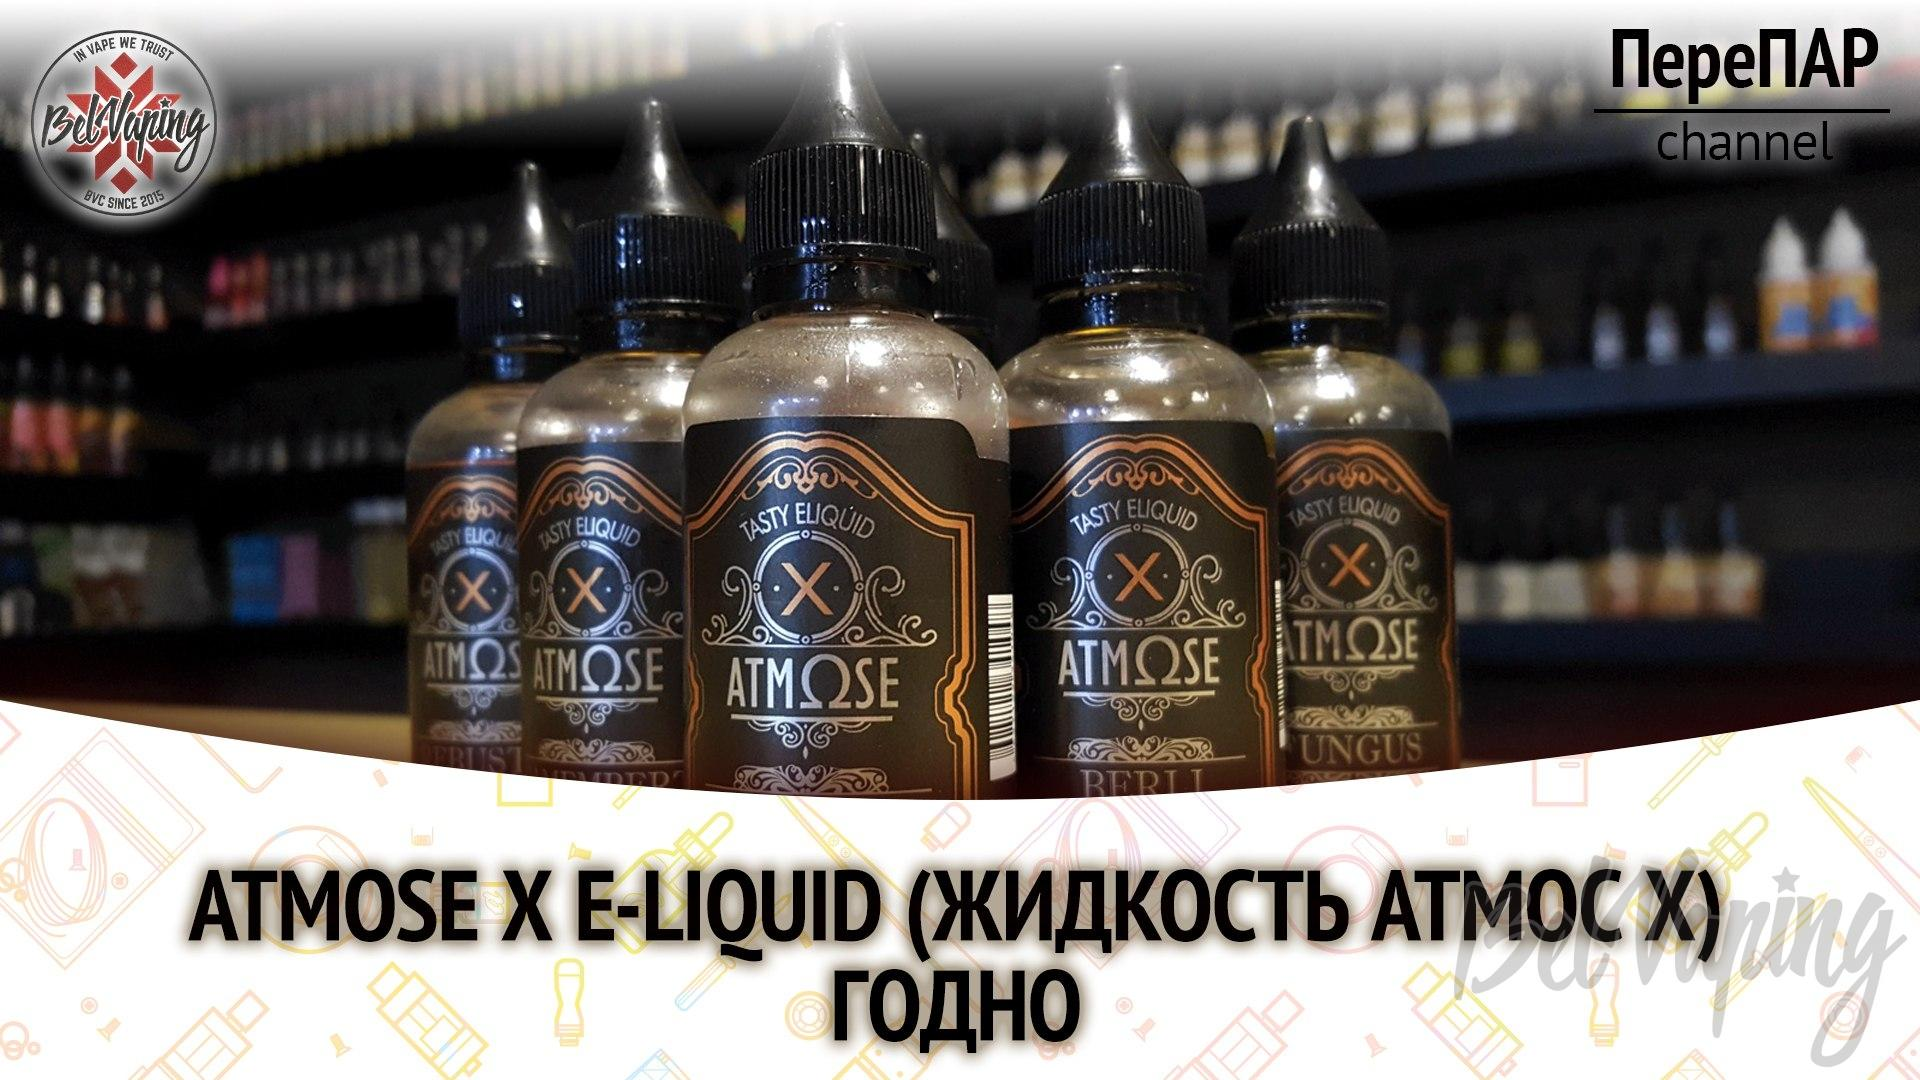 Обзор жидкости для вейпинга Atmose X